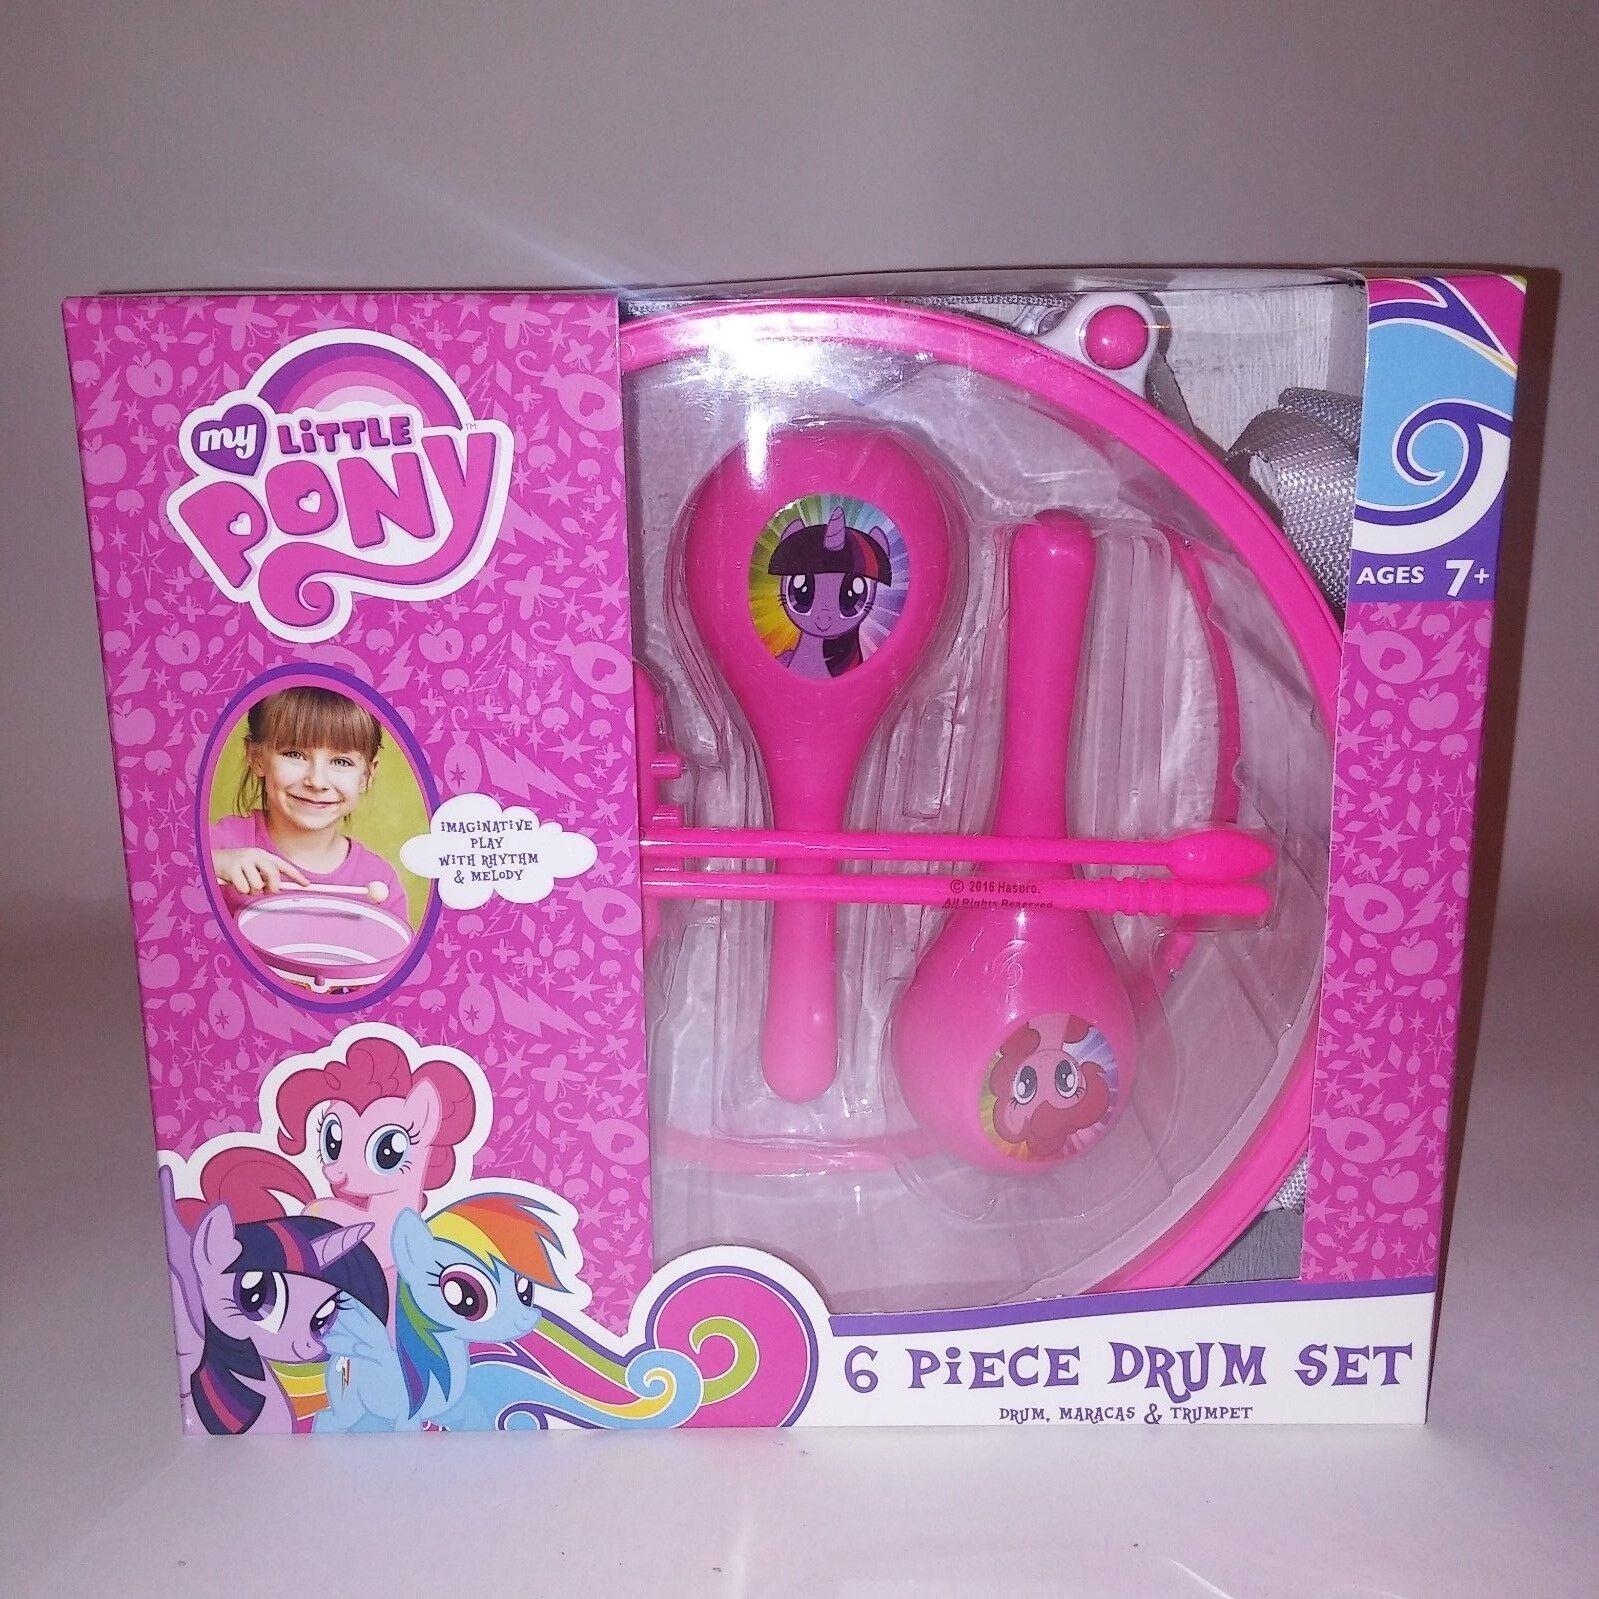 My Little Pony 6 Piece Drum Set Maracas Trumpet Kids Toys Music